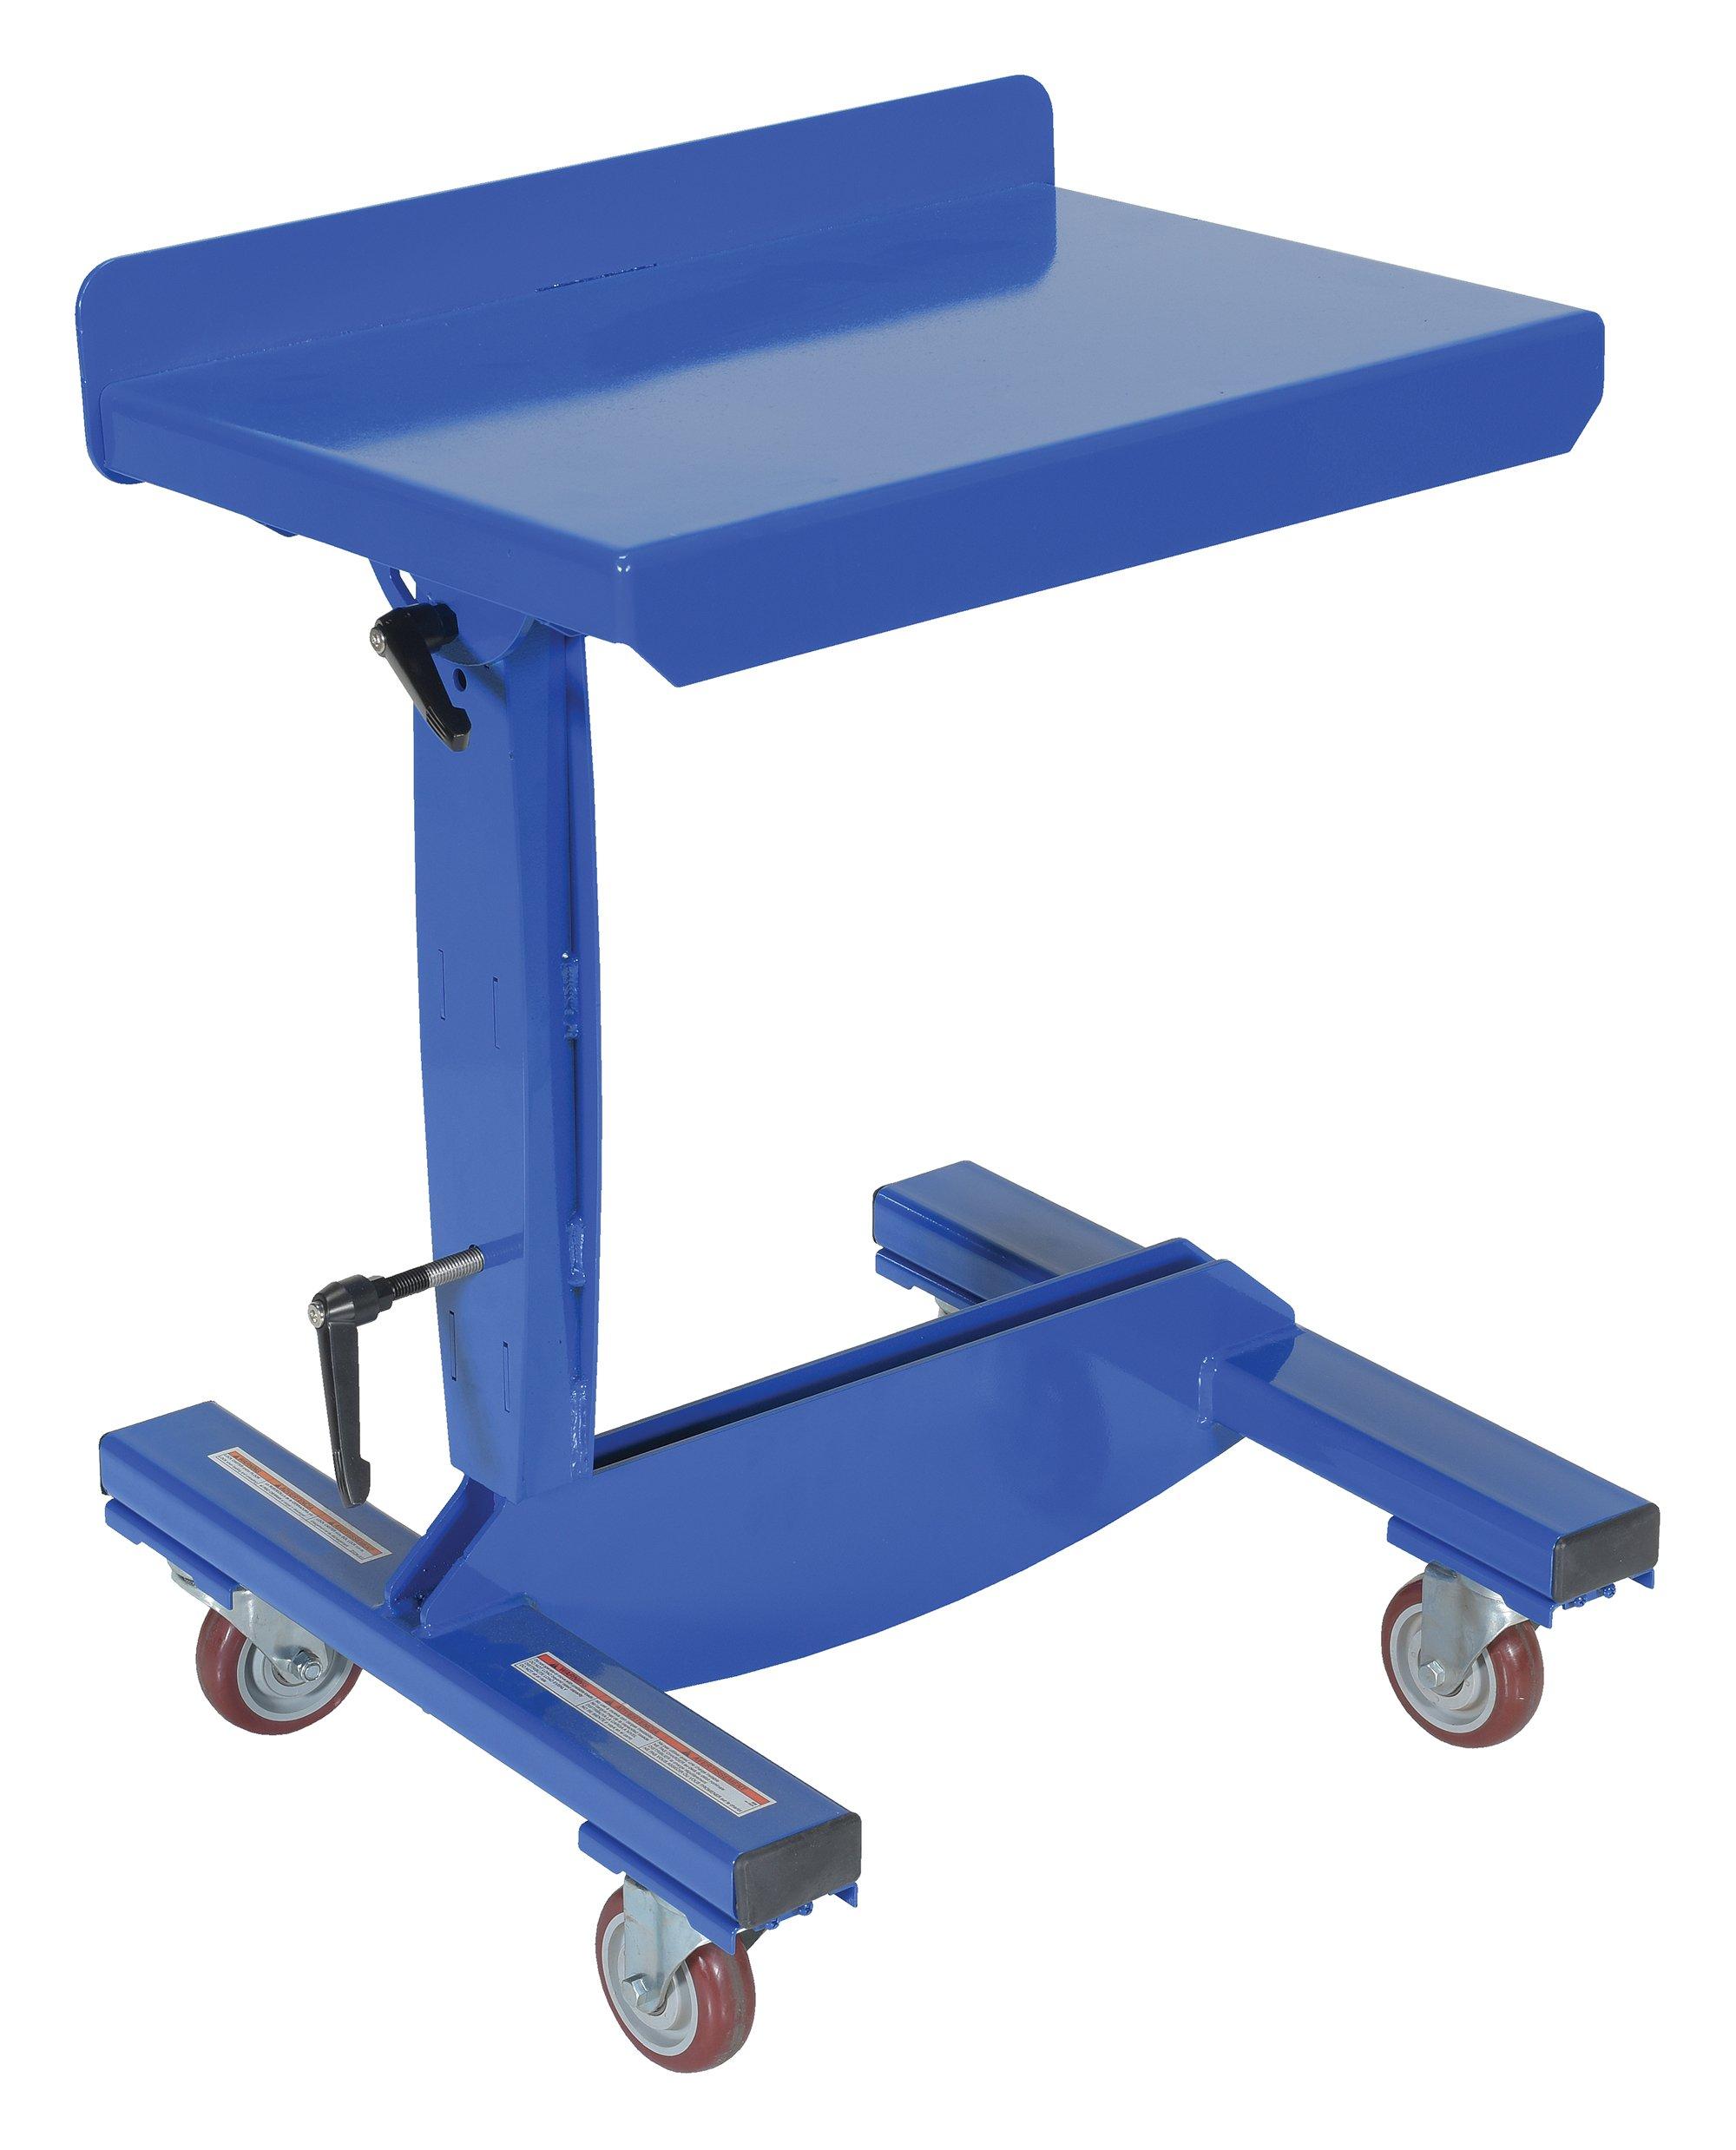 Vestil WPT-1624 Mobile Tilting Work Table, 200 lb. Capacity, 16'' Width x 24'' Length, 31-1/2'' to 42'' Height, Blue